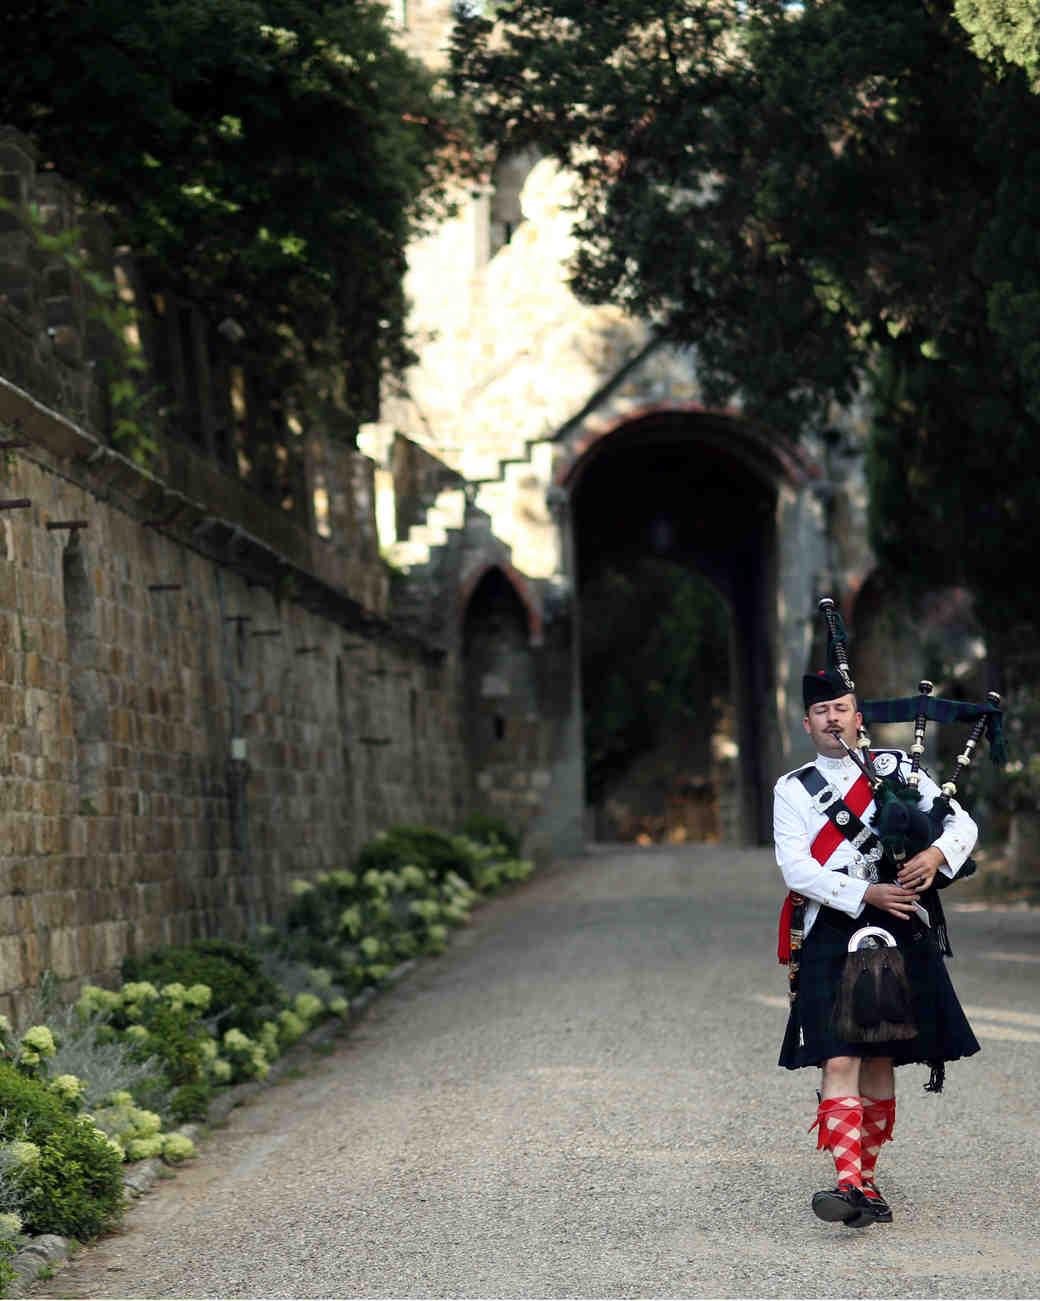 lindsay-andy-wedding-bagpipe-5823-s111659-1114.jpg